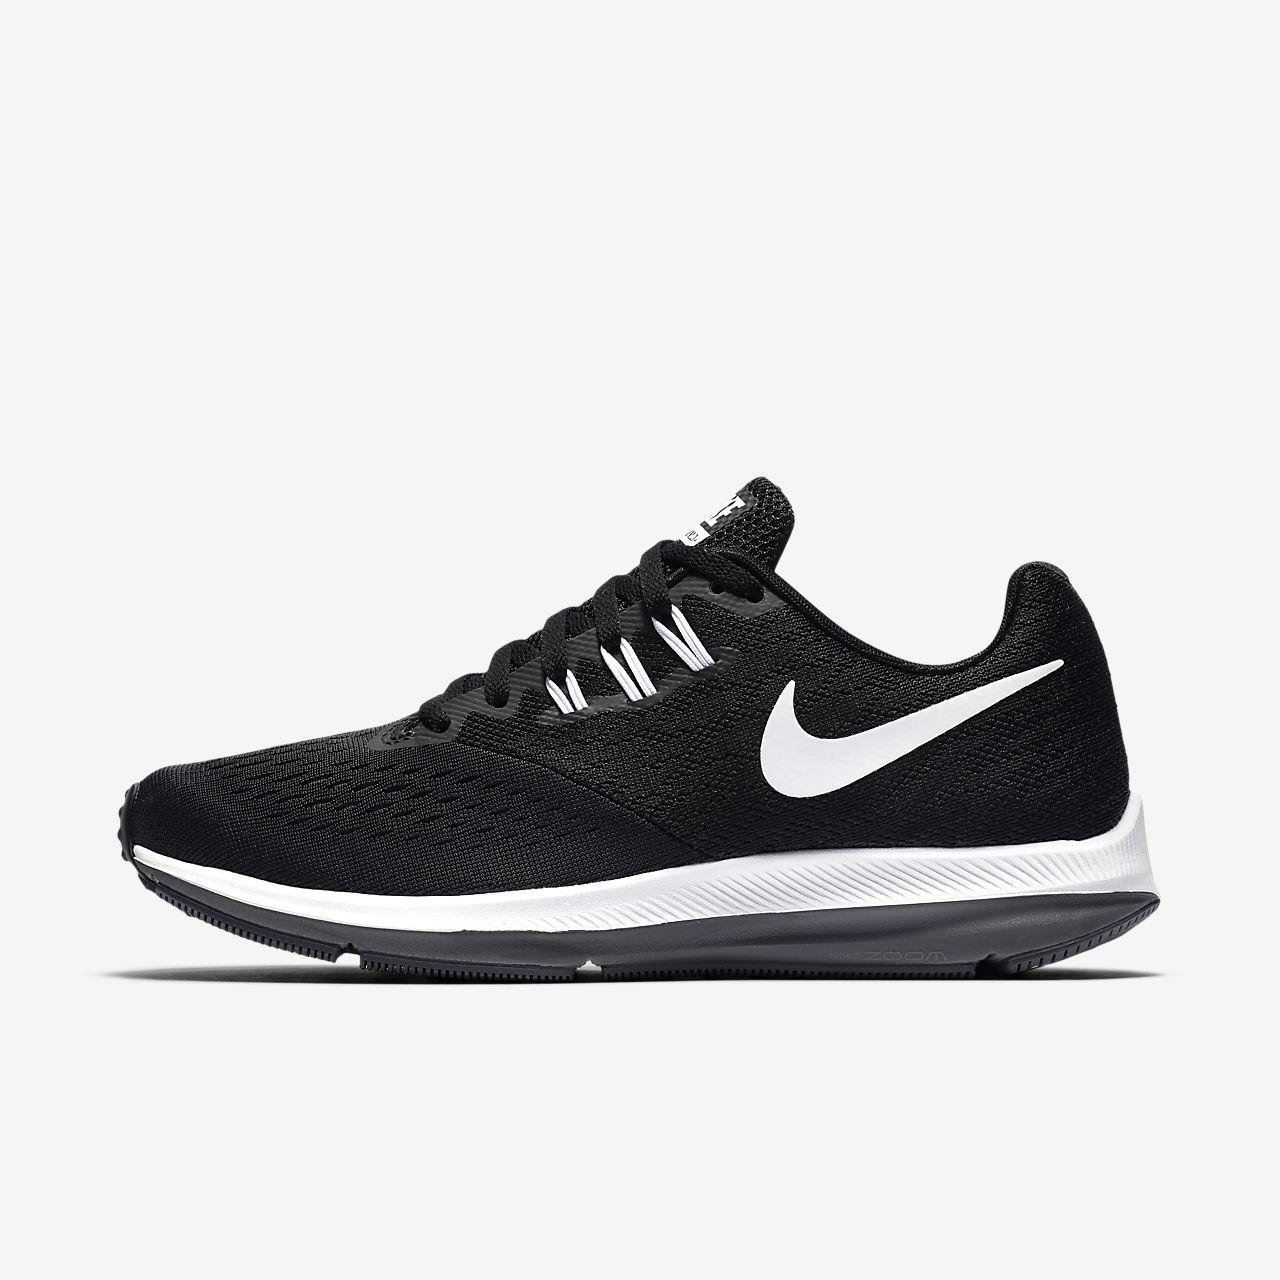 Calzado de running para mujer Nike Zoom Winflo 4. Nike.com MX c070d34261189